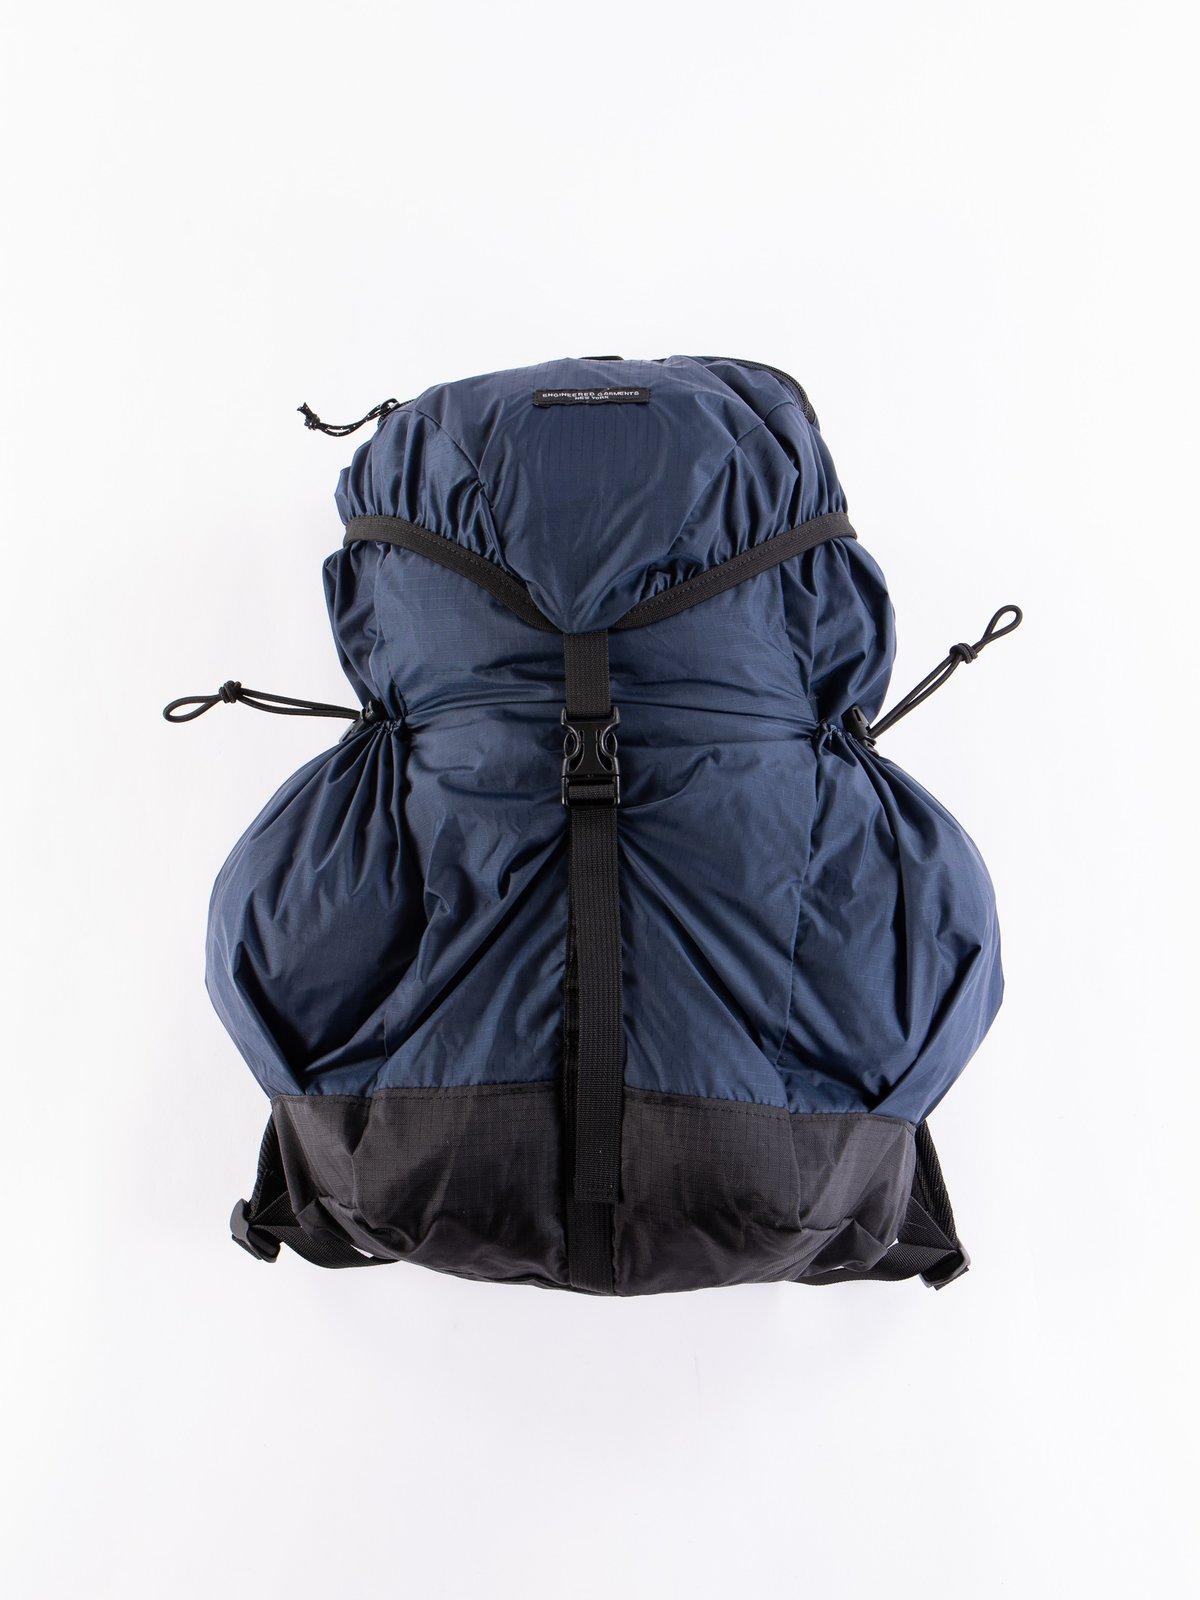 Navy Nylon Ripstop UL Backpack - Image 1